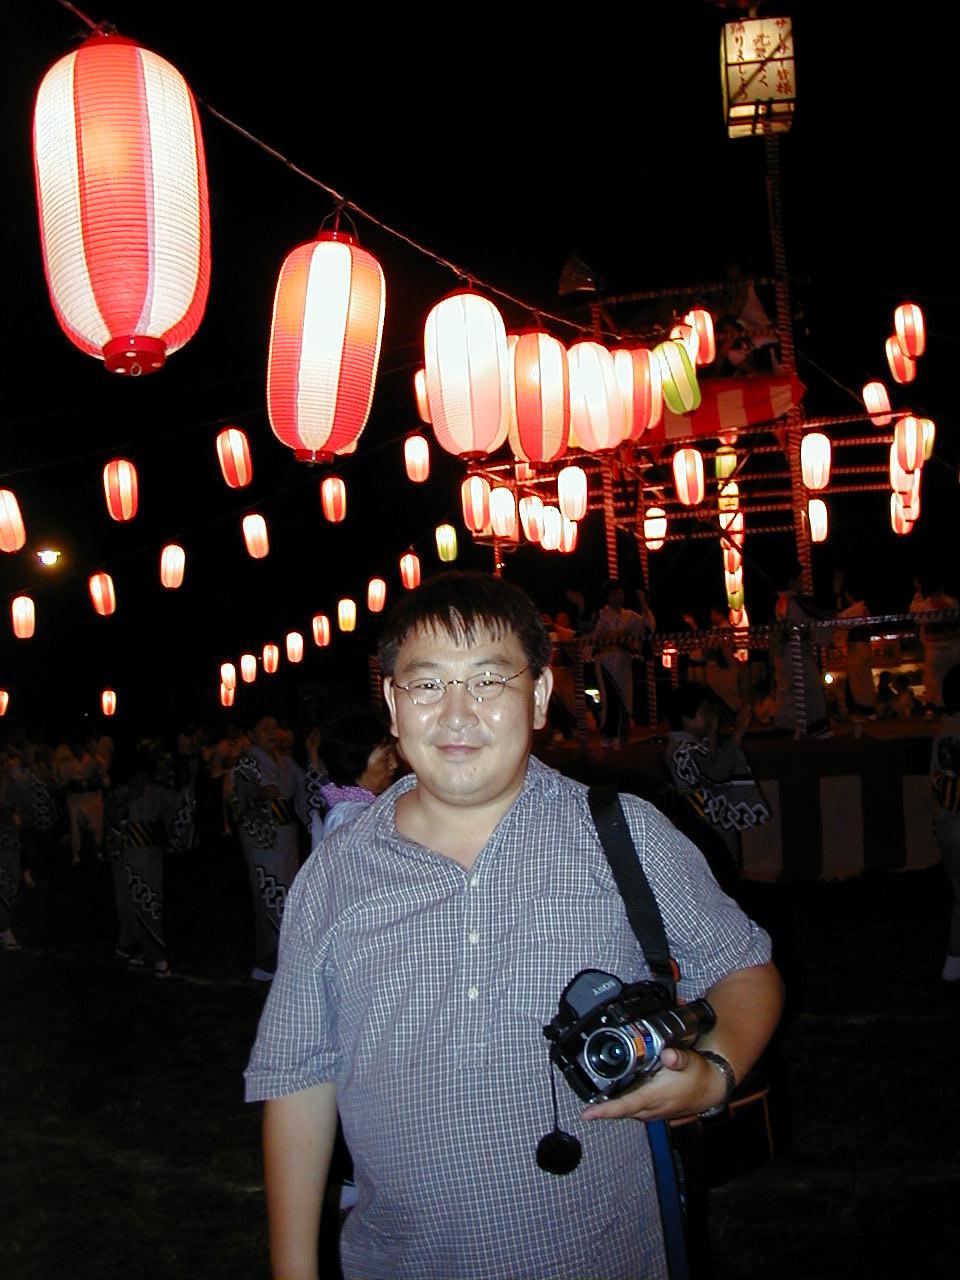 Праздник лета - Нацу-мацури или Бон-одори в Токио!